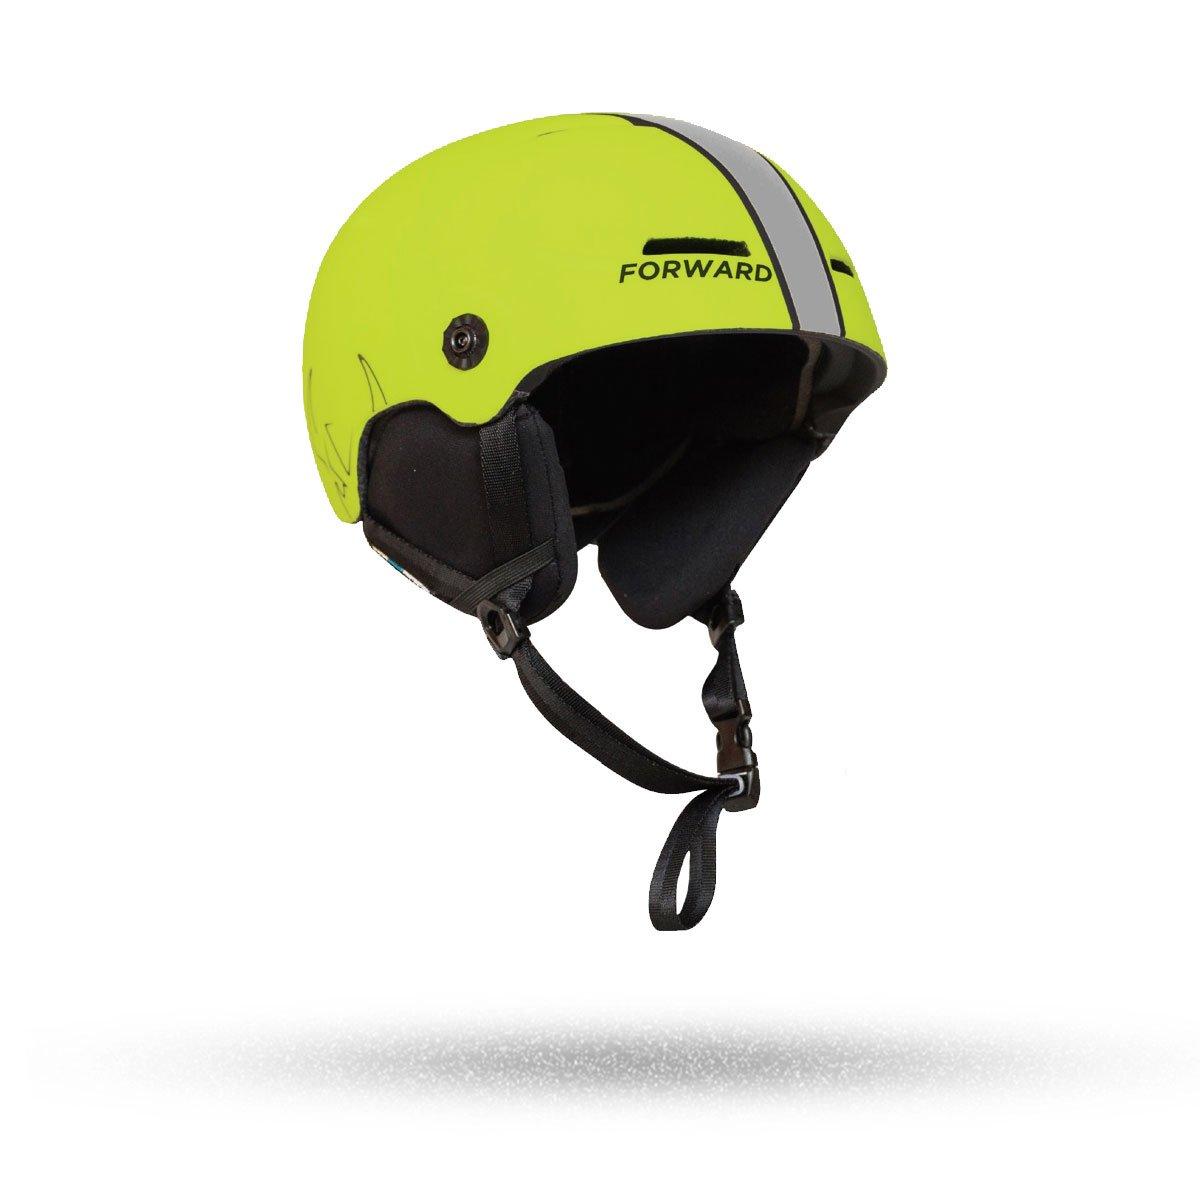 Forward WIP X-OVER Helmet Sailing / Skiiing 2018 - Yellow